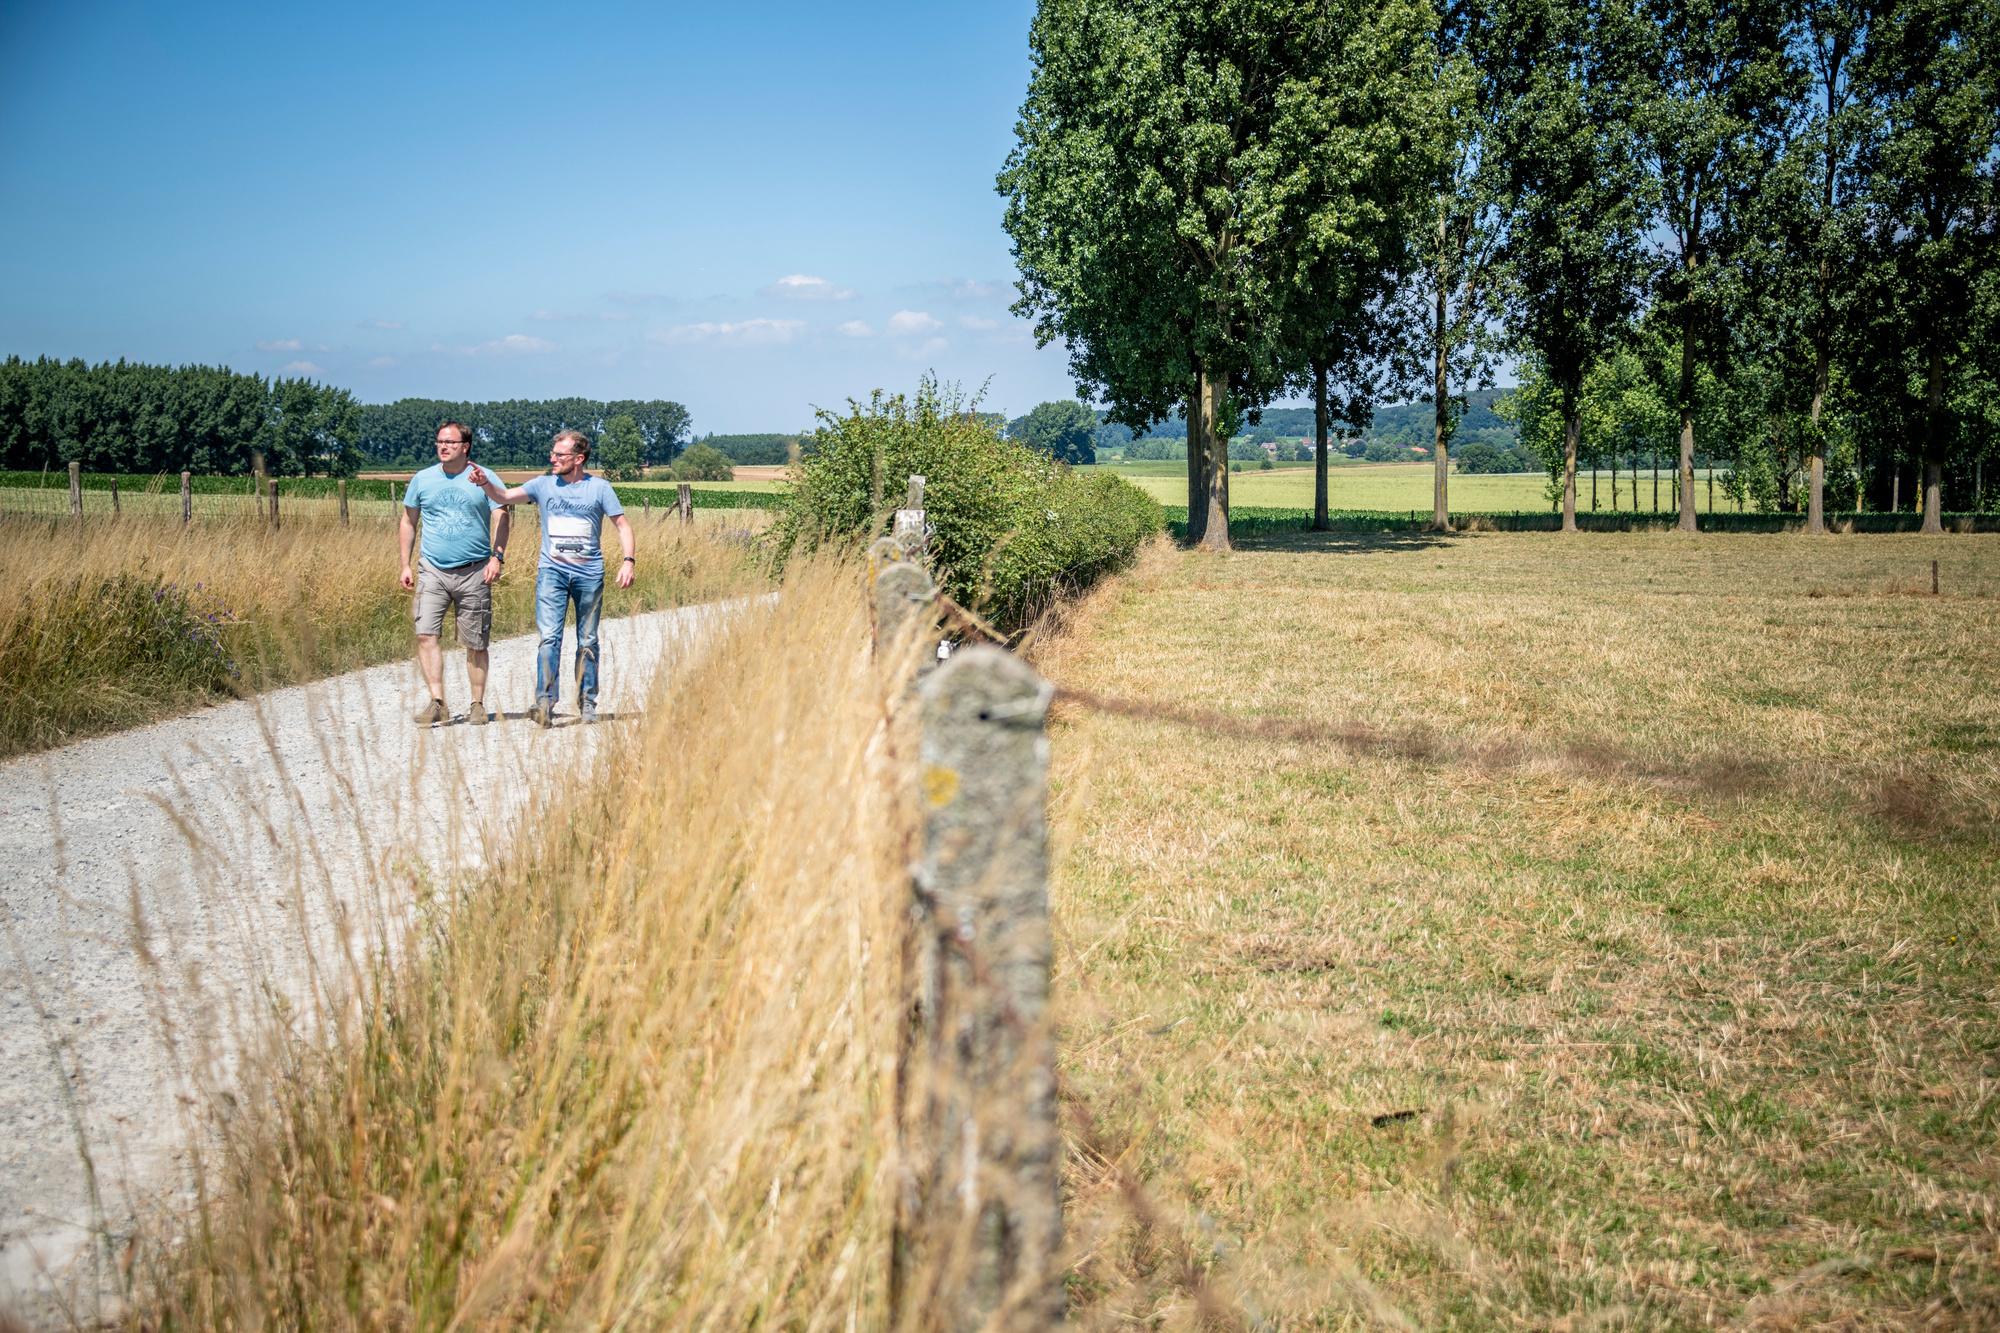 Lander Loeckx-Toerisme Vlaams-Brabant